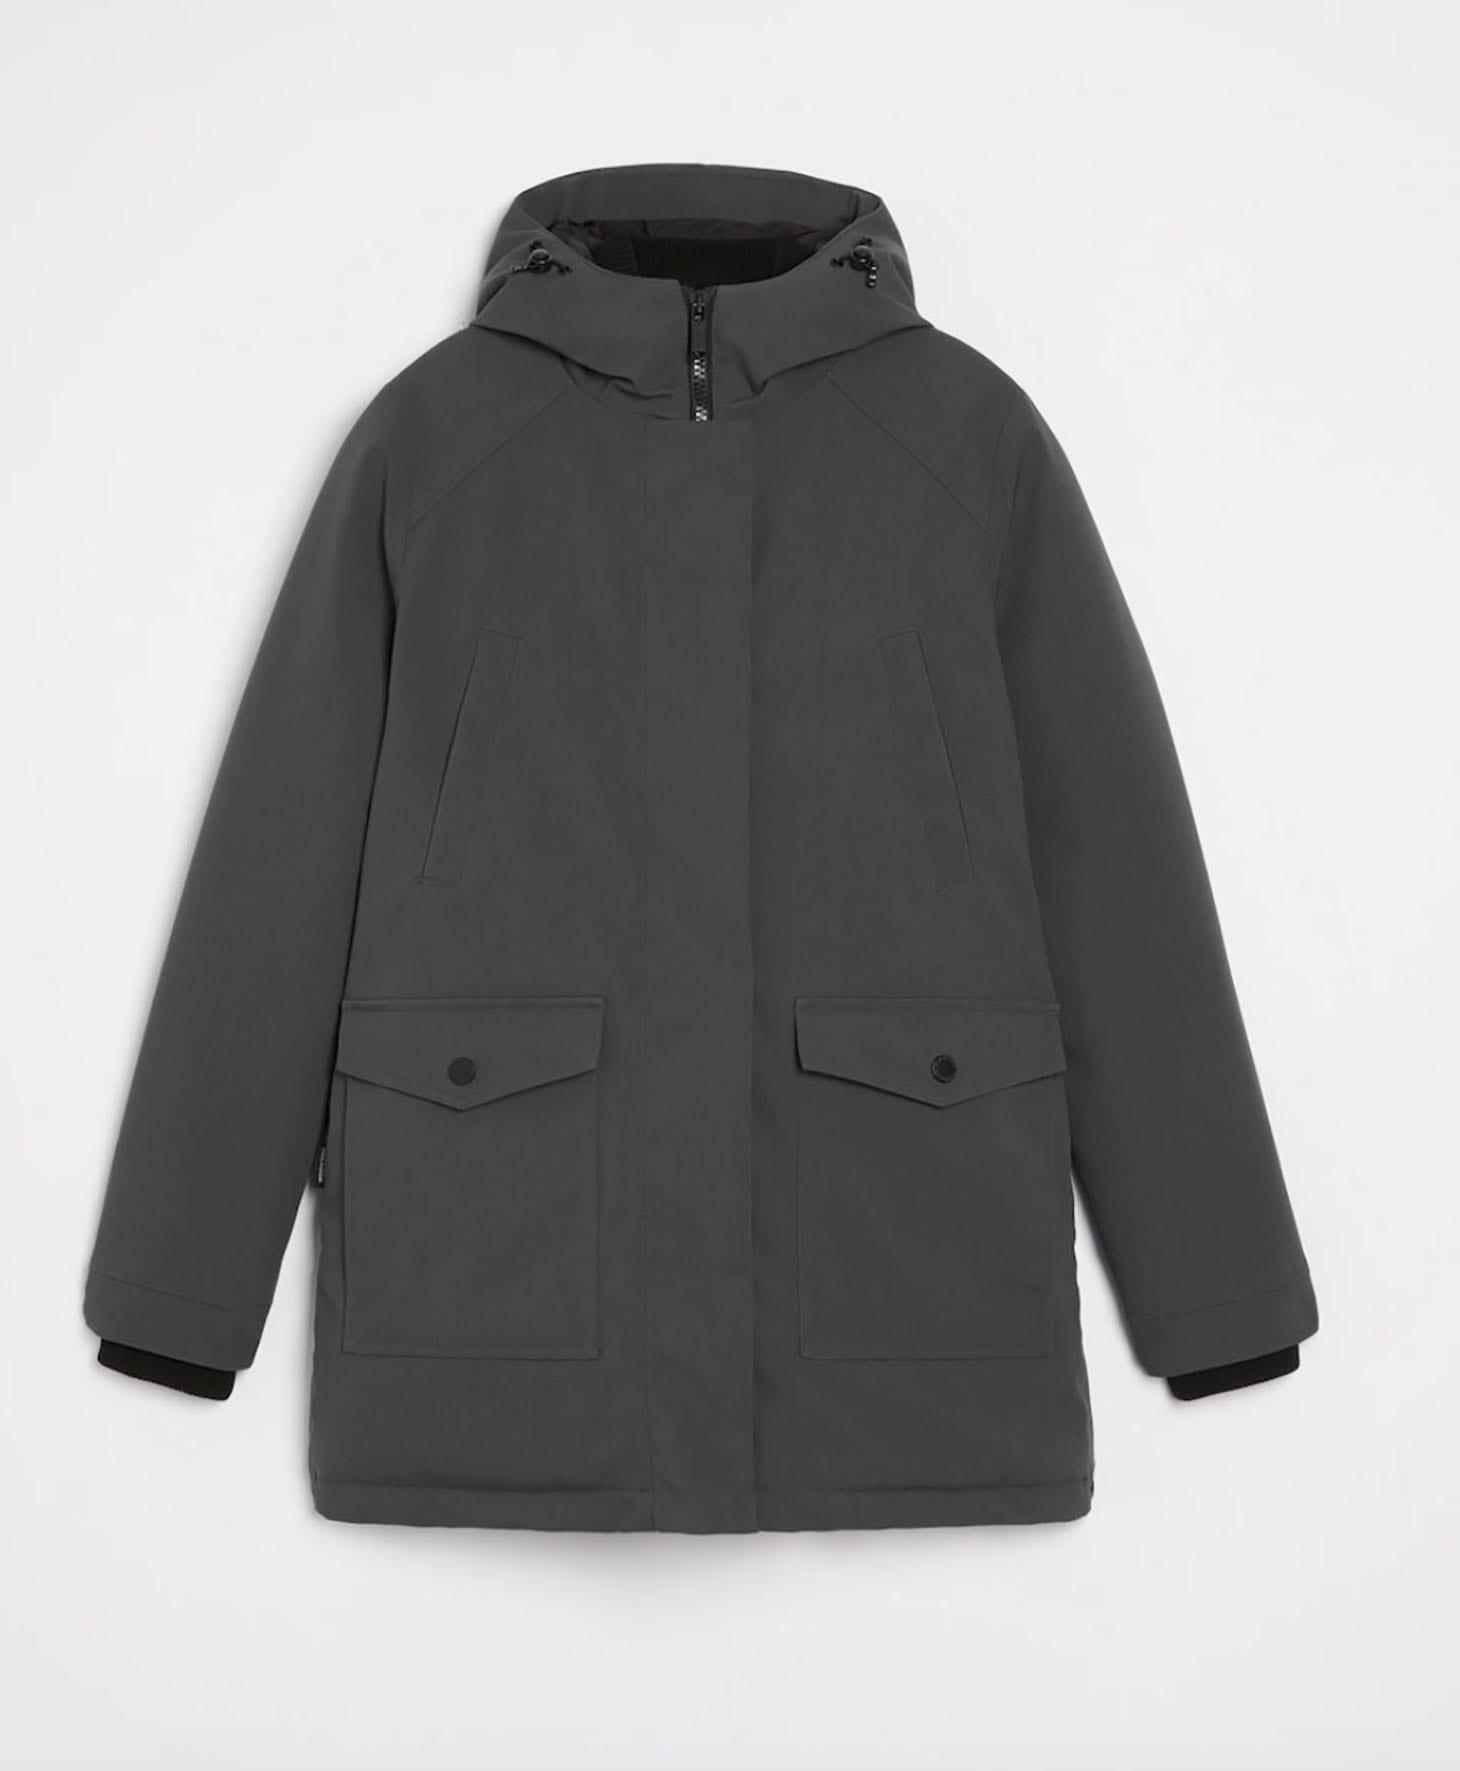 Jillian Harris Winter Coat Guide